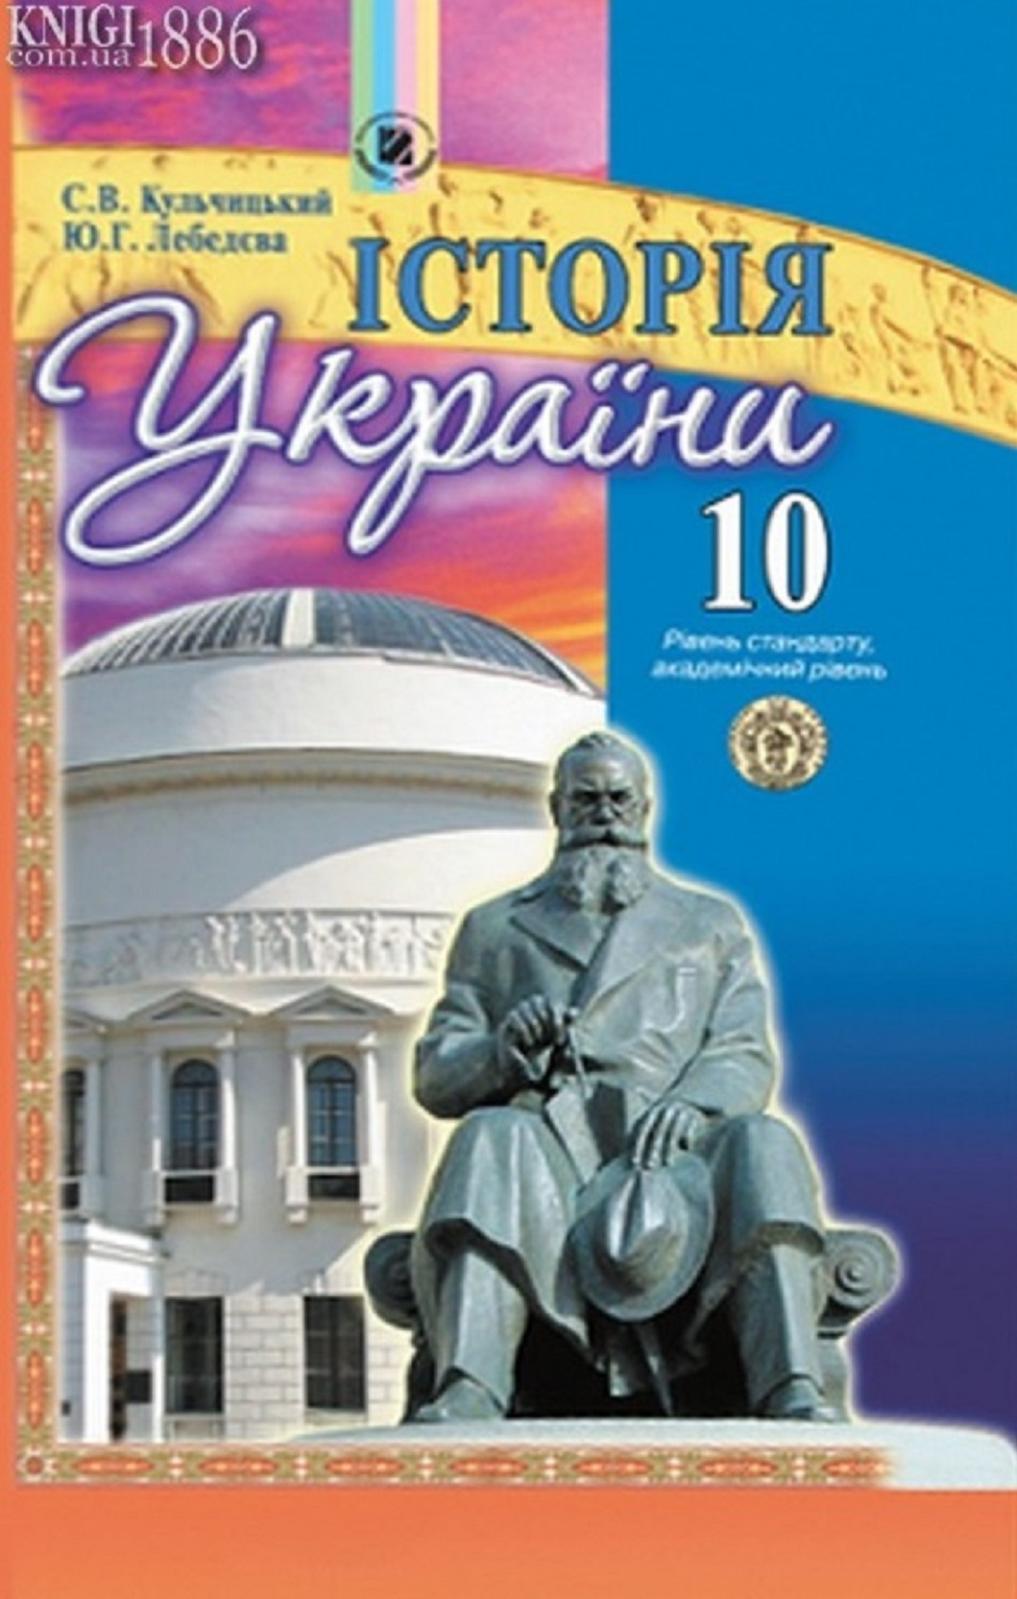 Calaméo - 10 клас. История Украины Kulchickij 2010 dd0cb5c177ed3